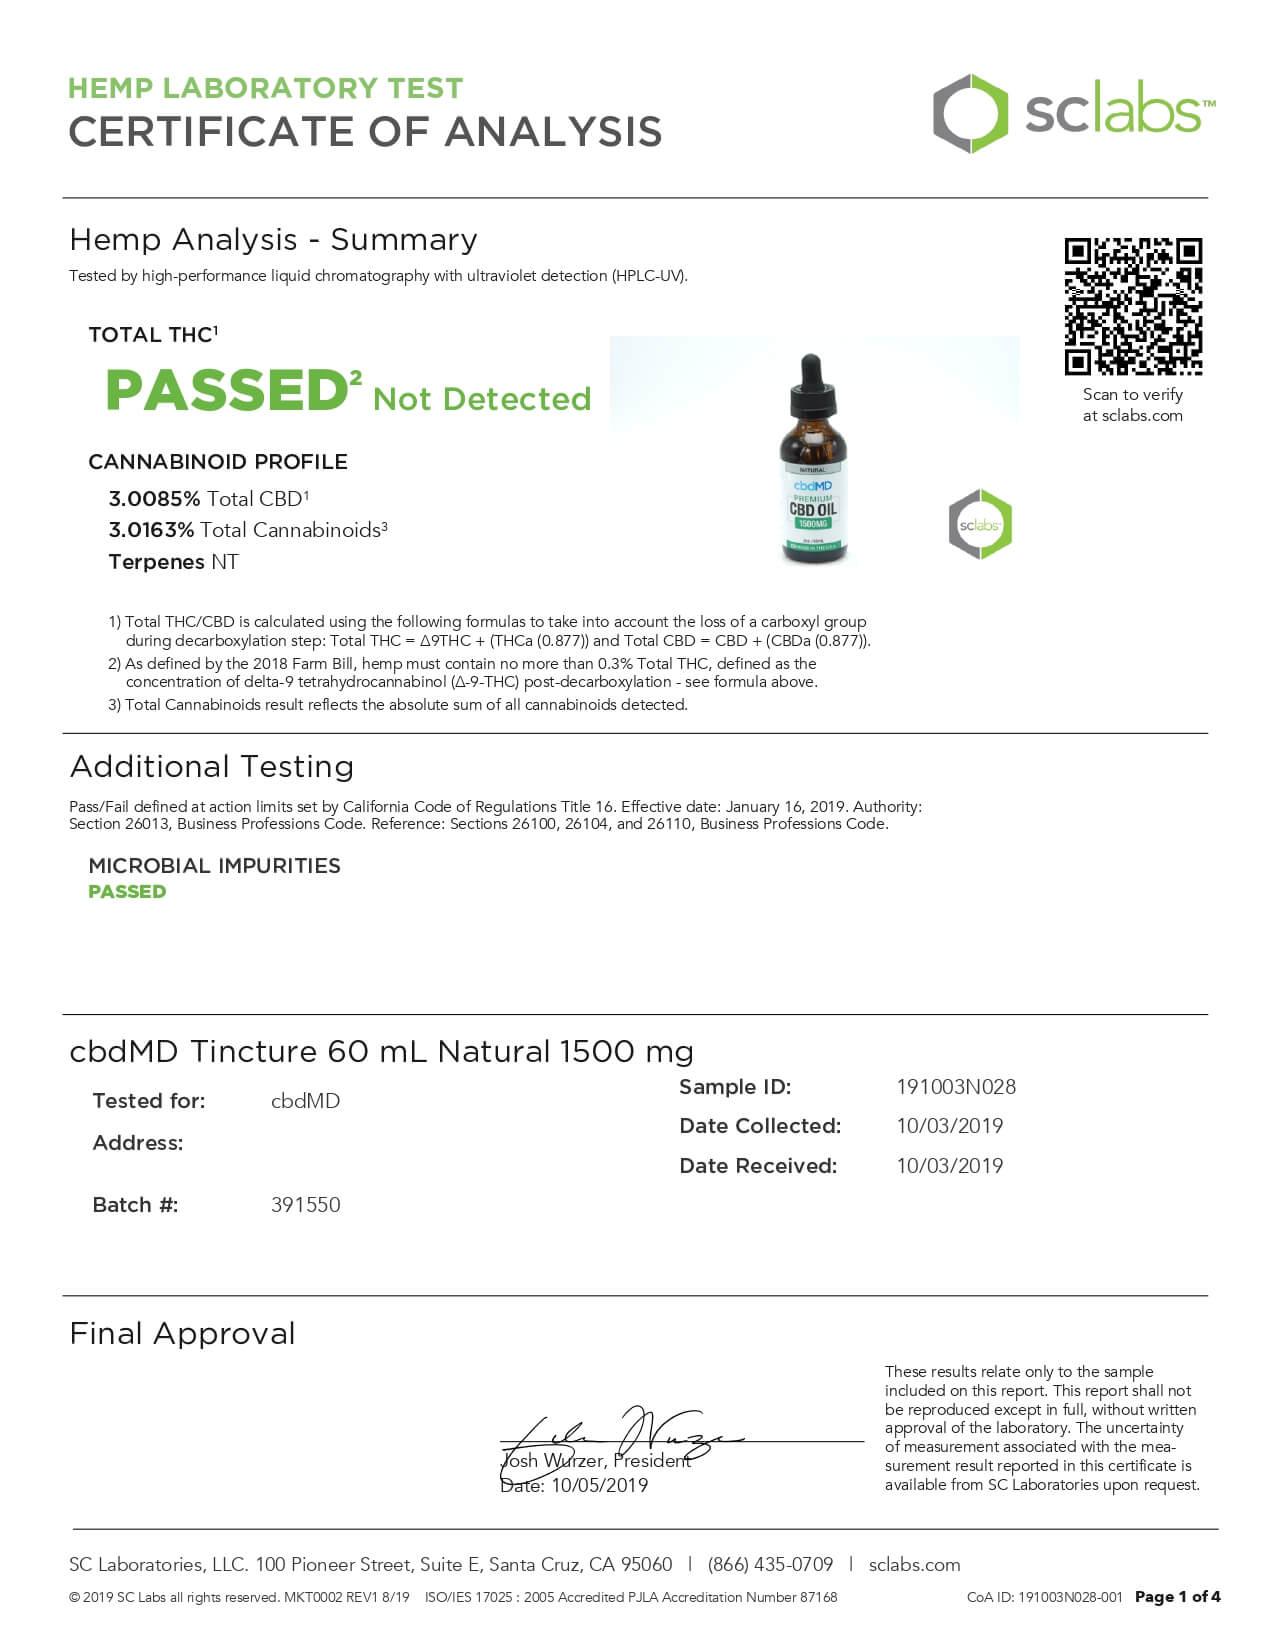 cbdMD CBD Tincture Broad Specrum Natural 60ml 1500mg Lab Report